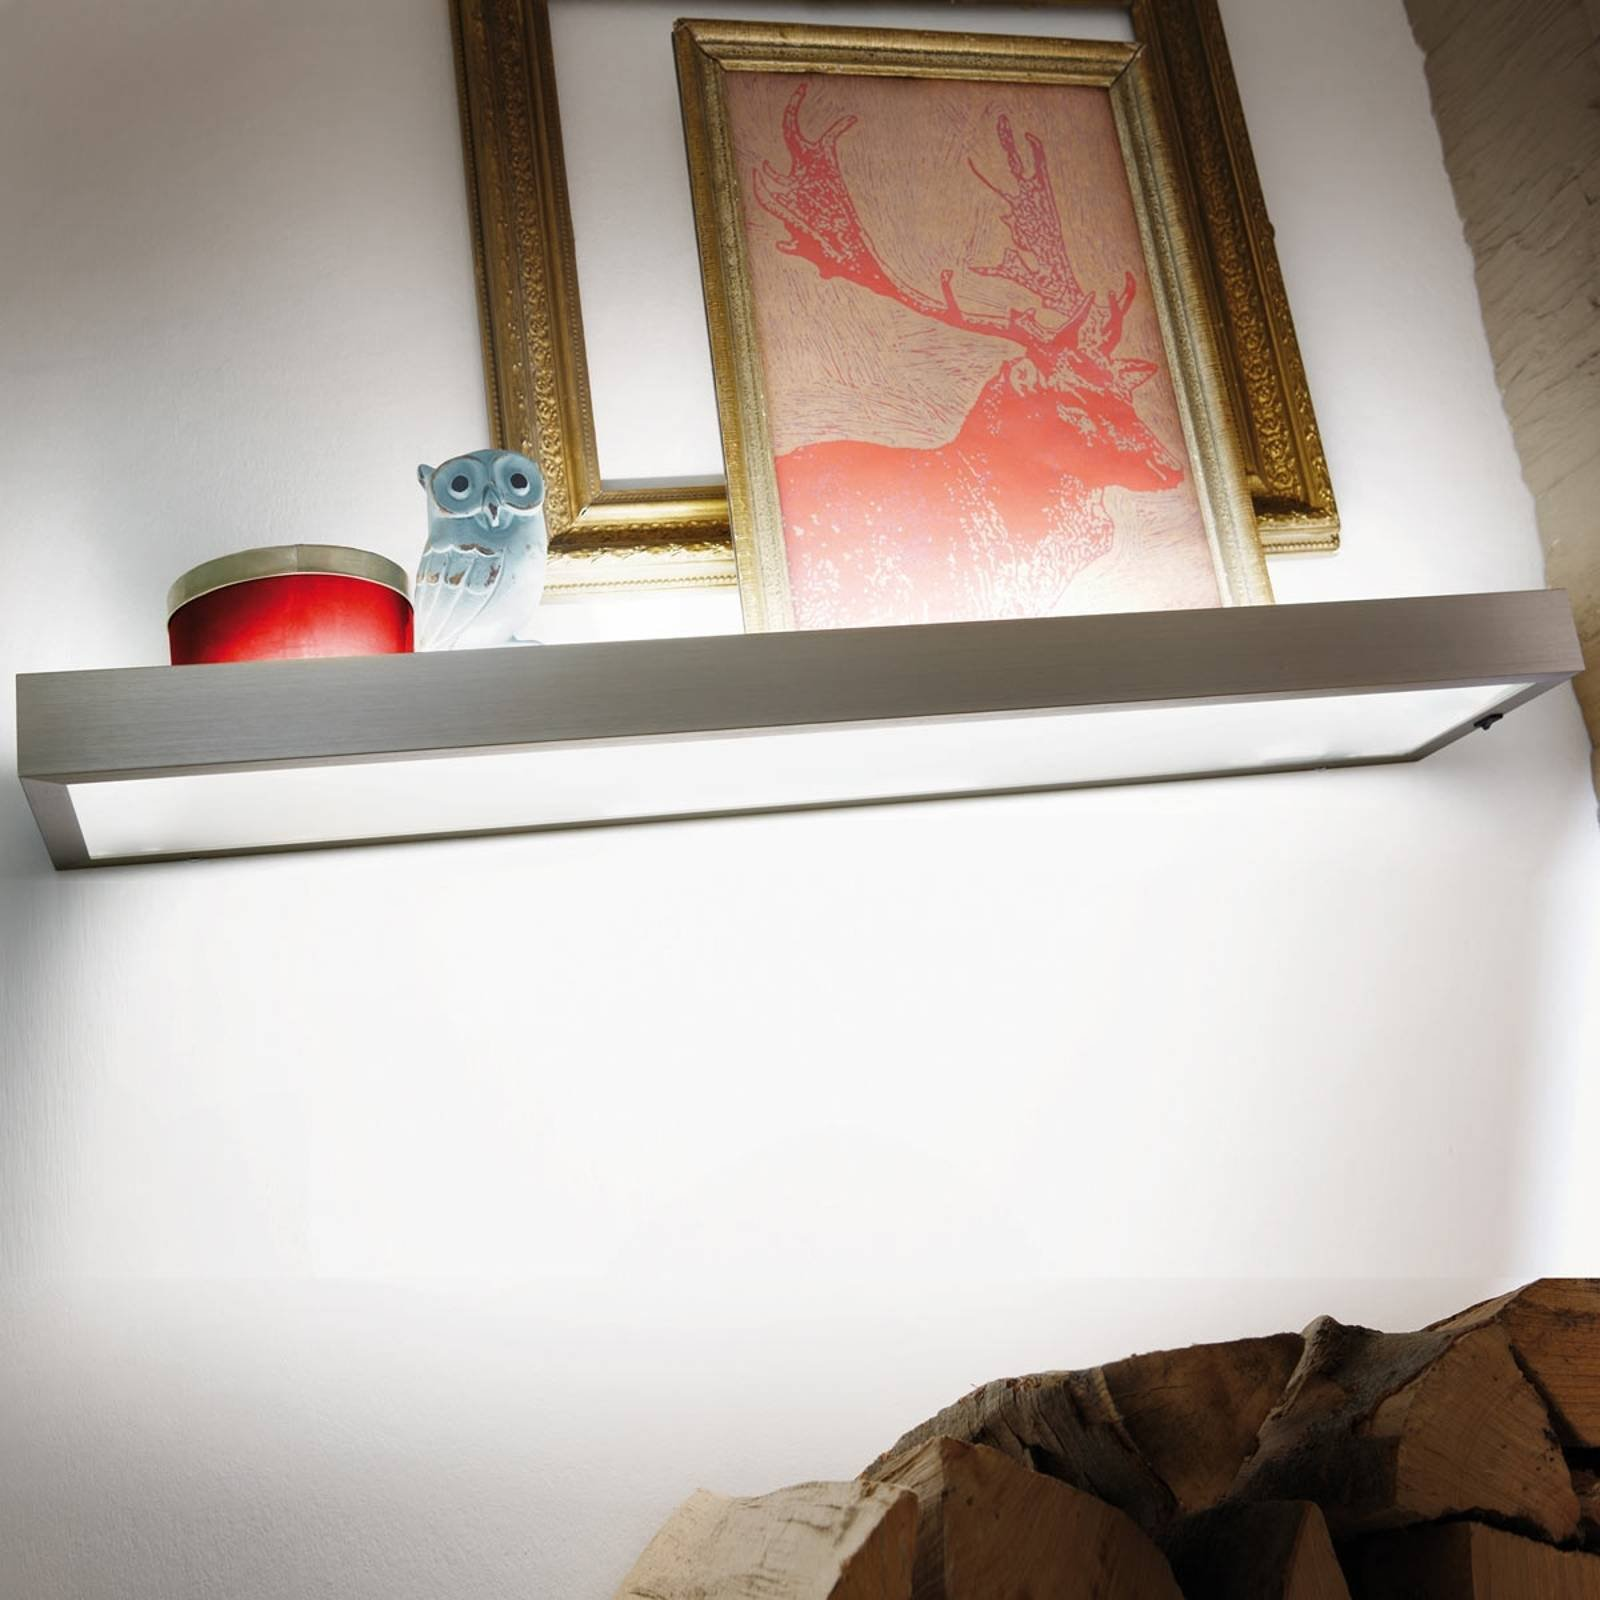 GS 2-LED dekorativt glass hyllelampe, 90 cm